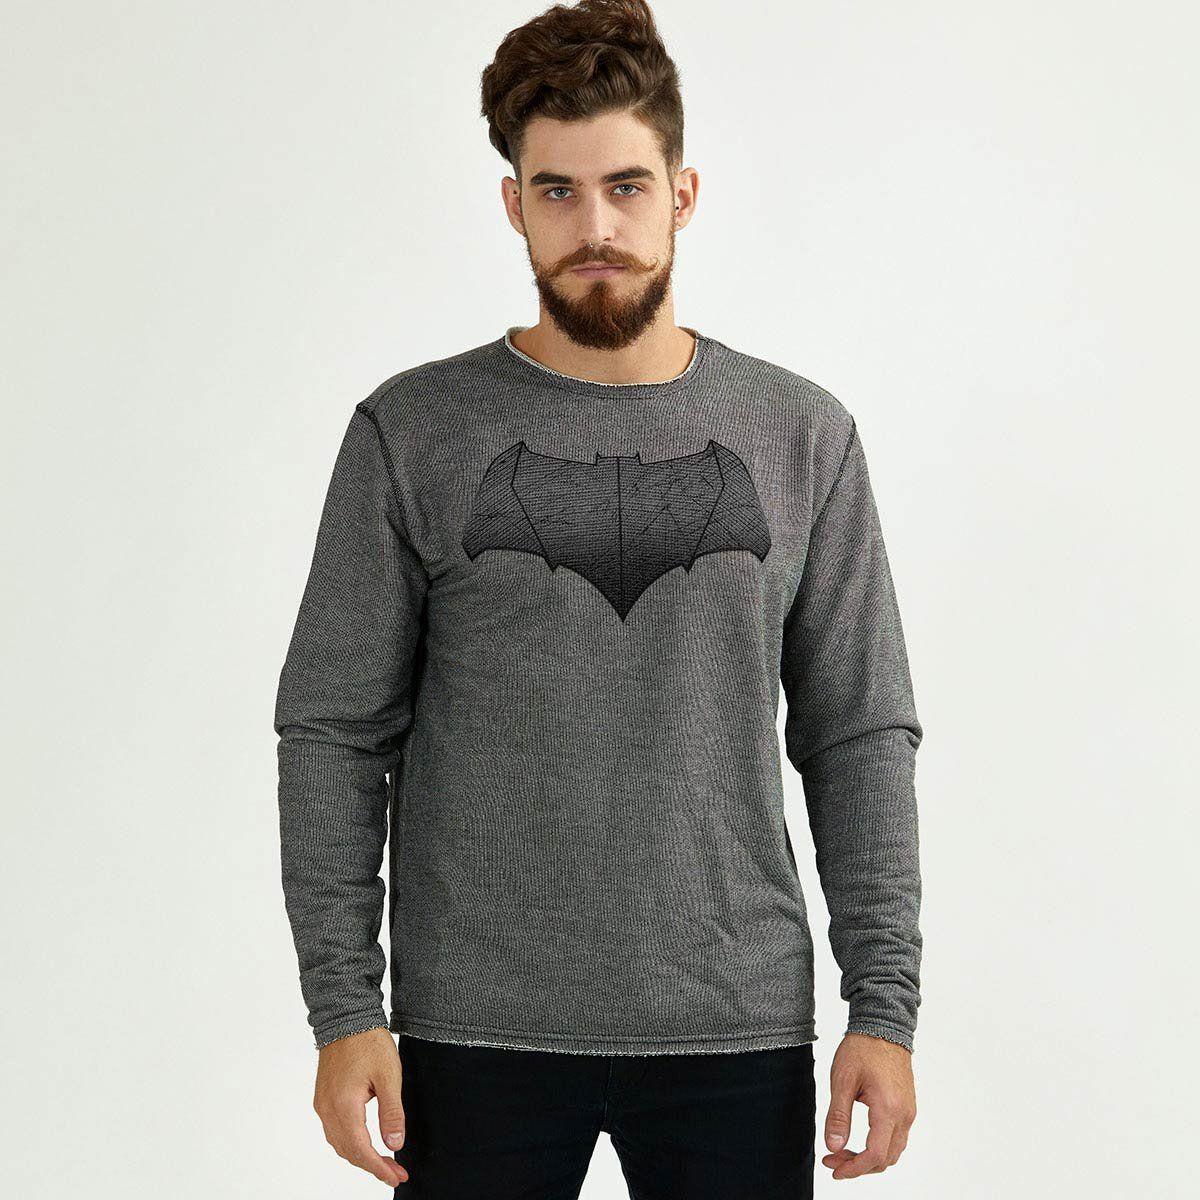 Moletinho Texturizado Batman Shield